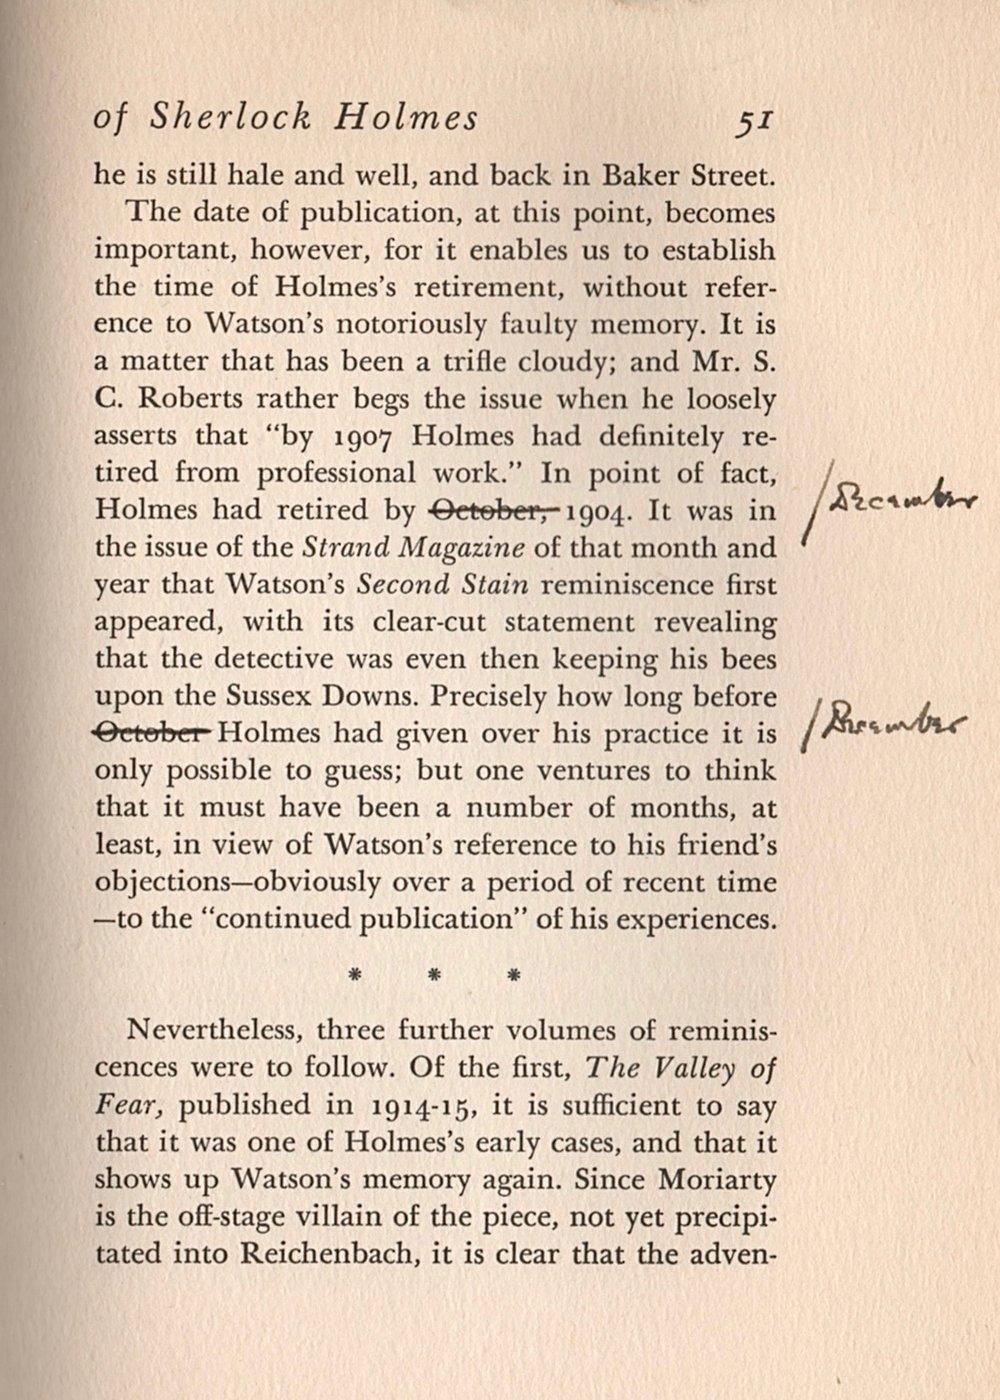 TPLOSH 1933 p. 51 corrections.jpg